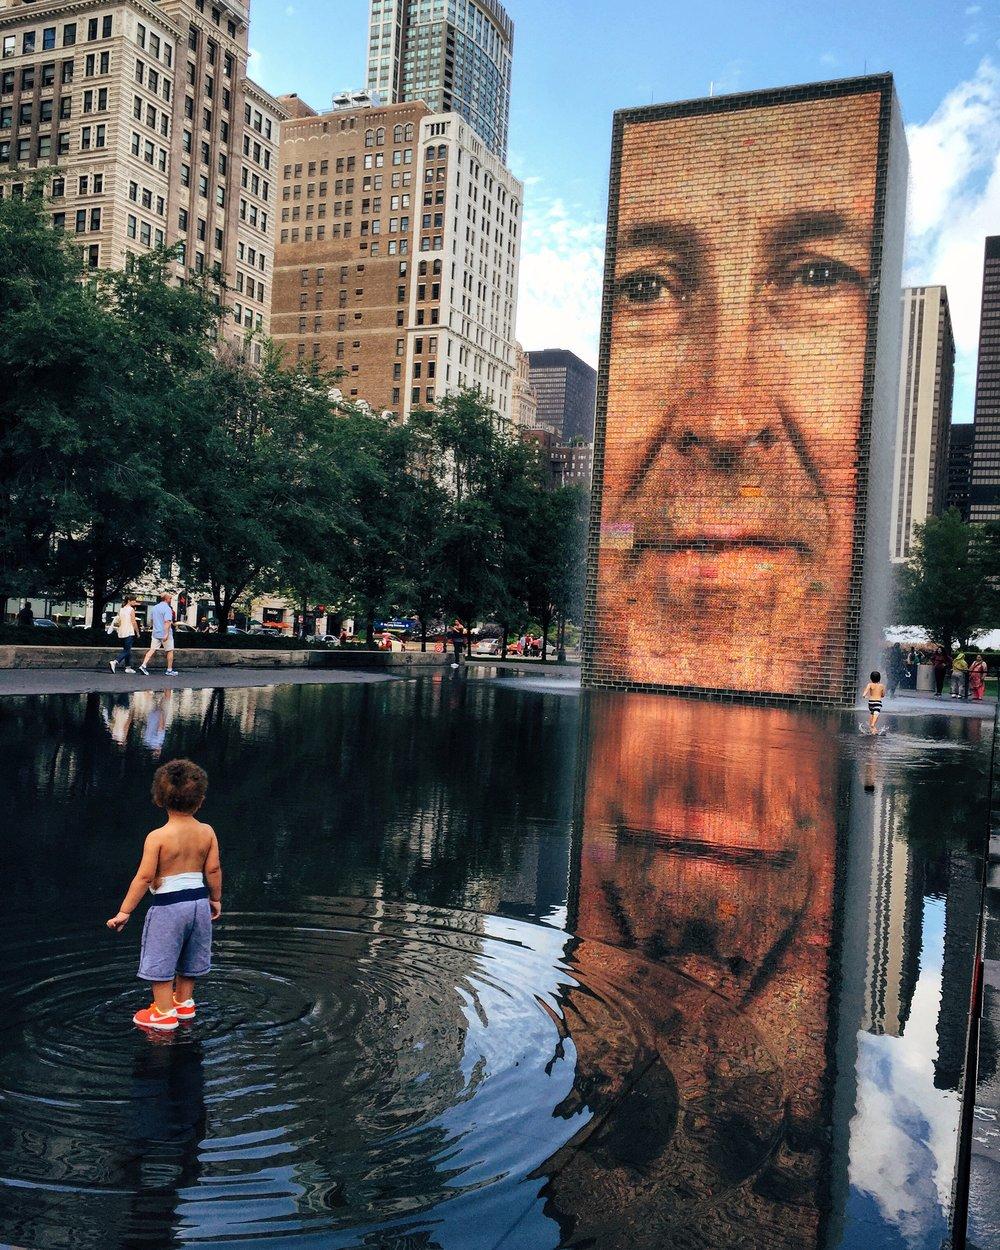 Darragh, Millennium Park, Chicago